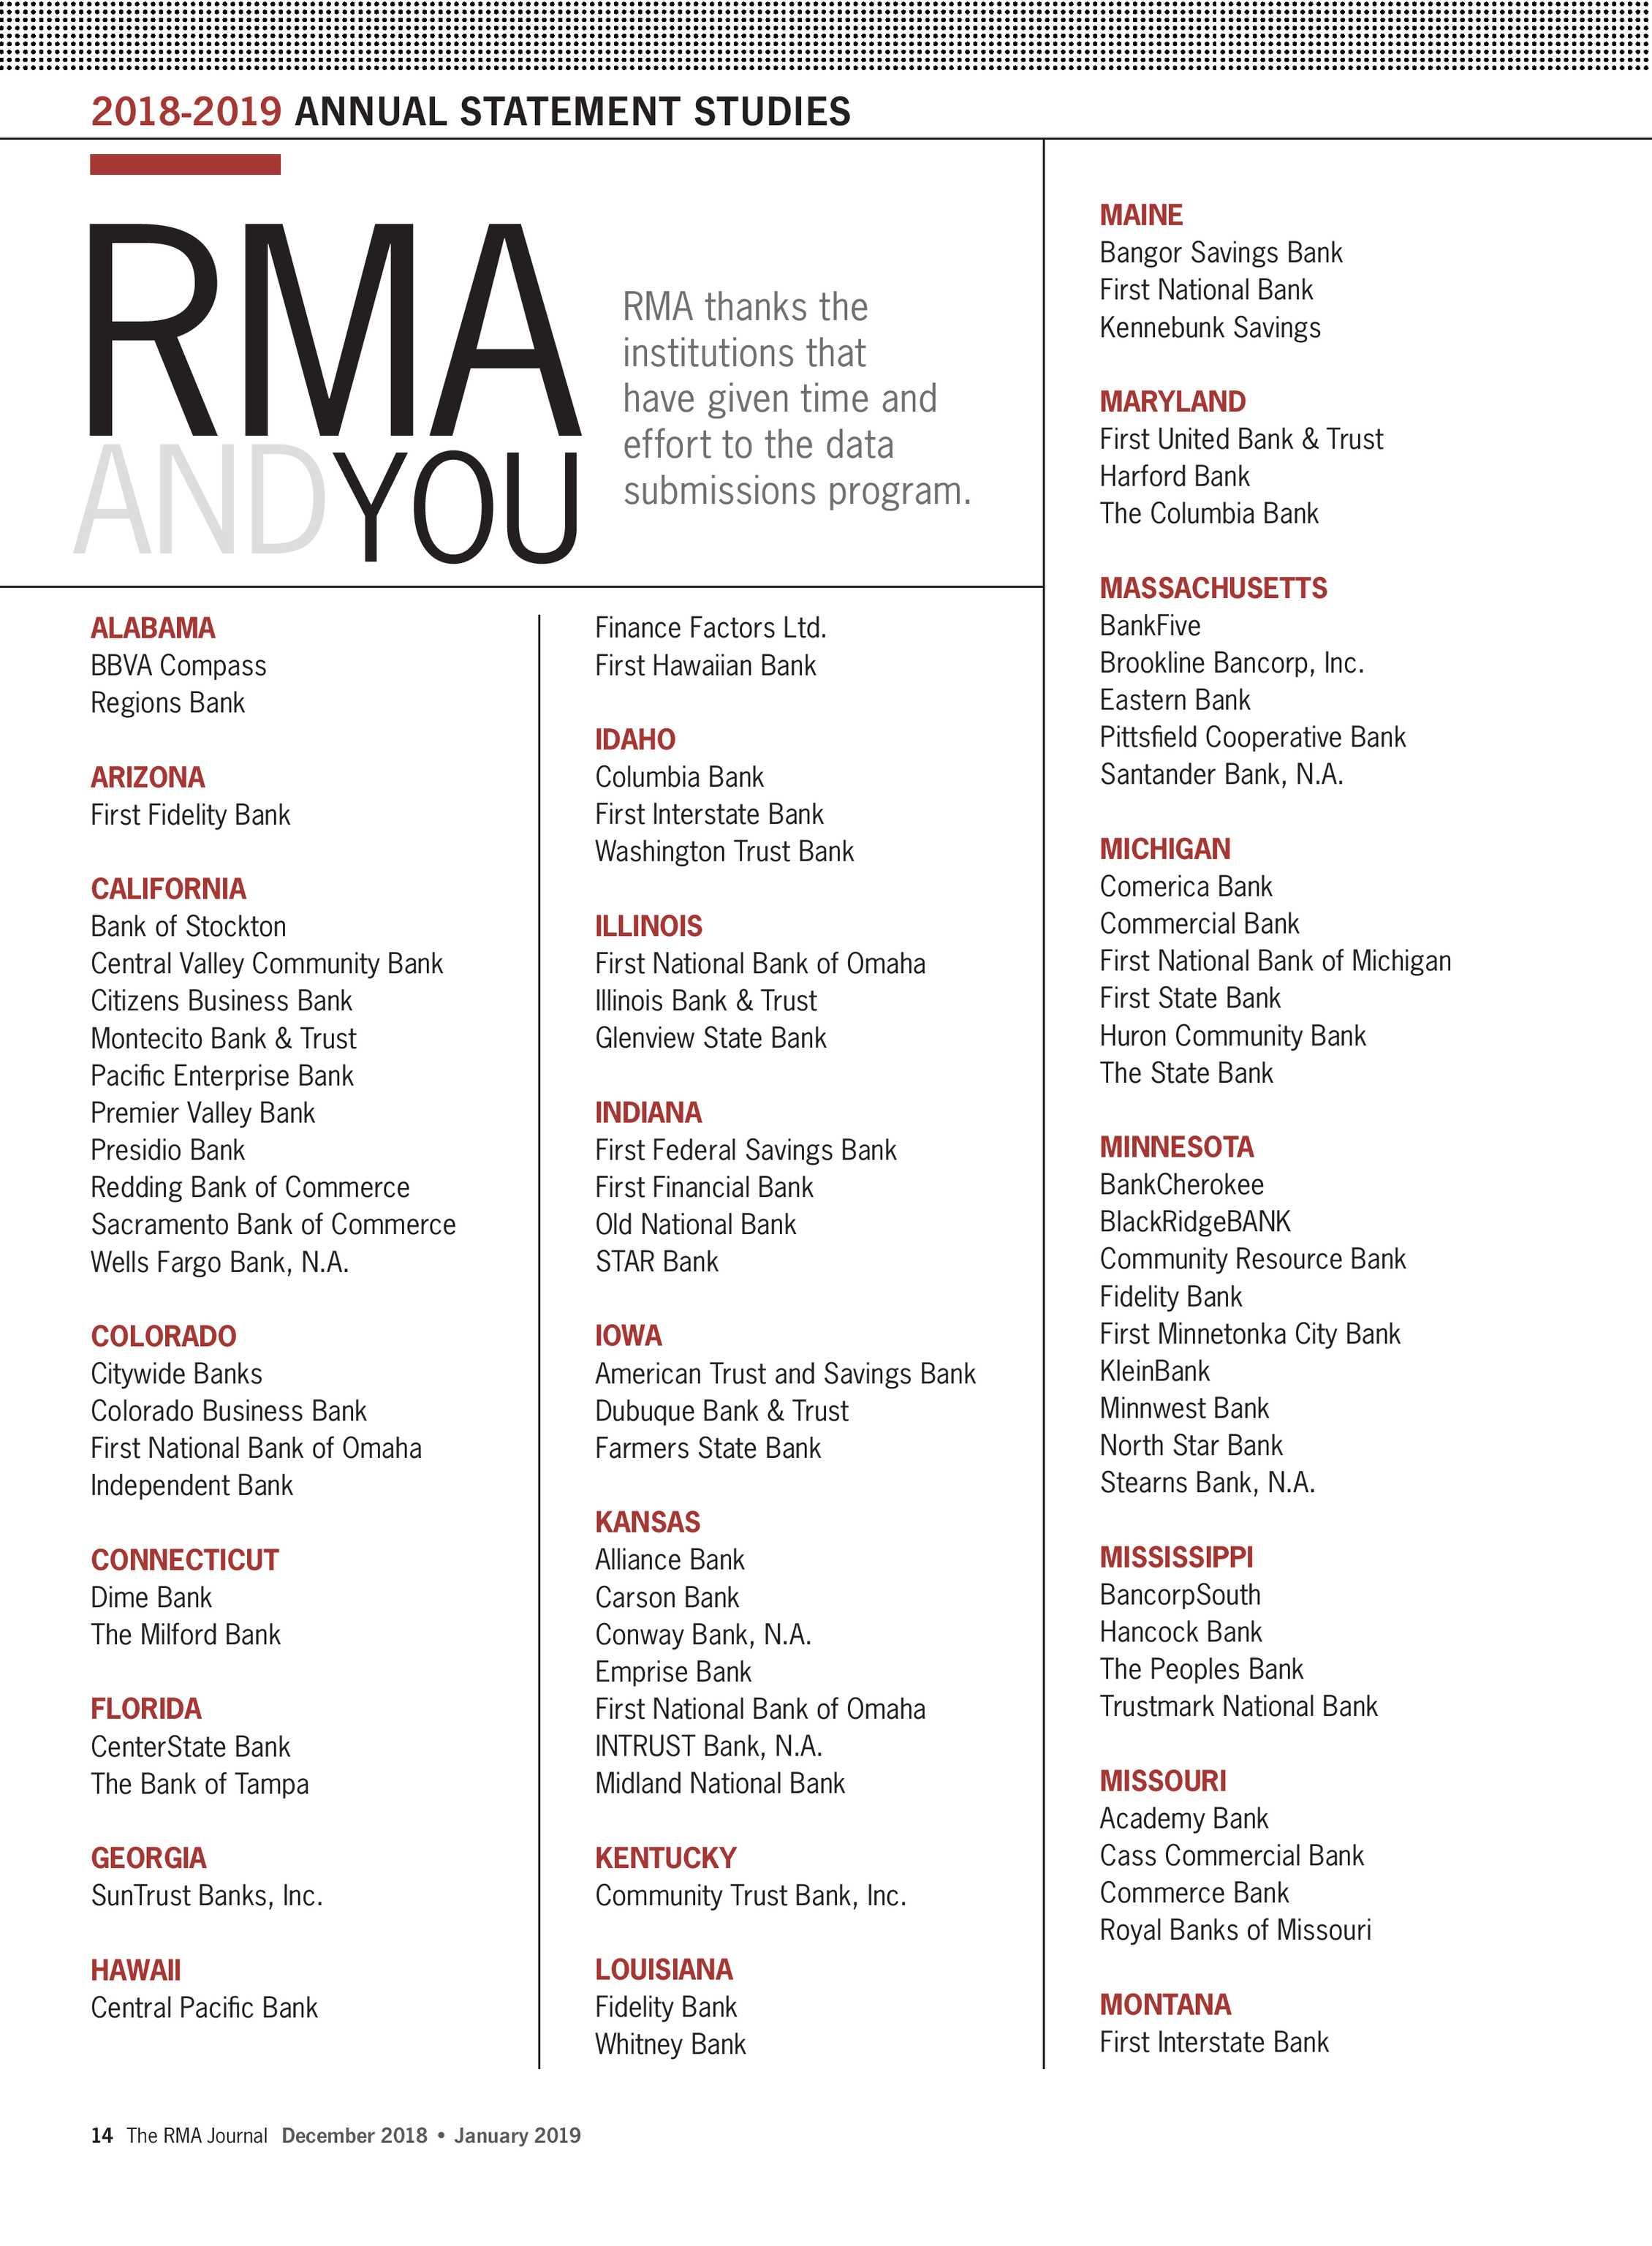 Florida Judgment Interest Rate December 2019 Calendar The RMA Journal   December 2018 January 2019   page 14